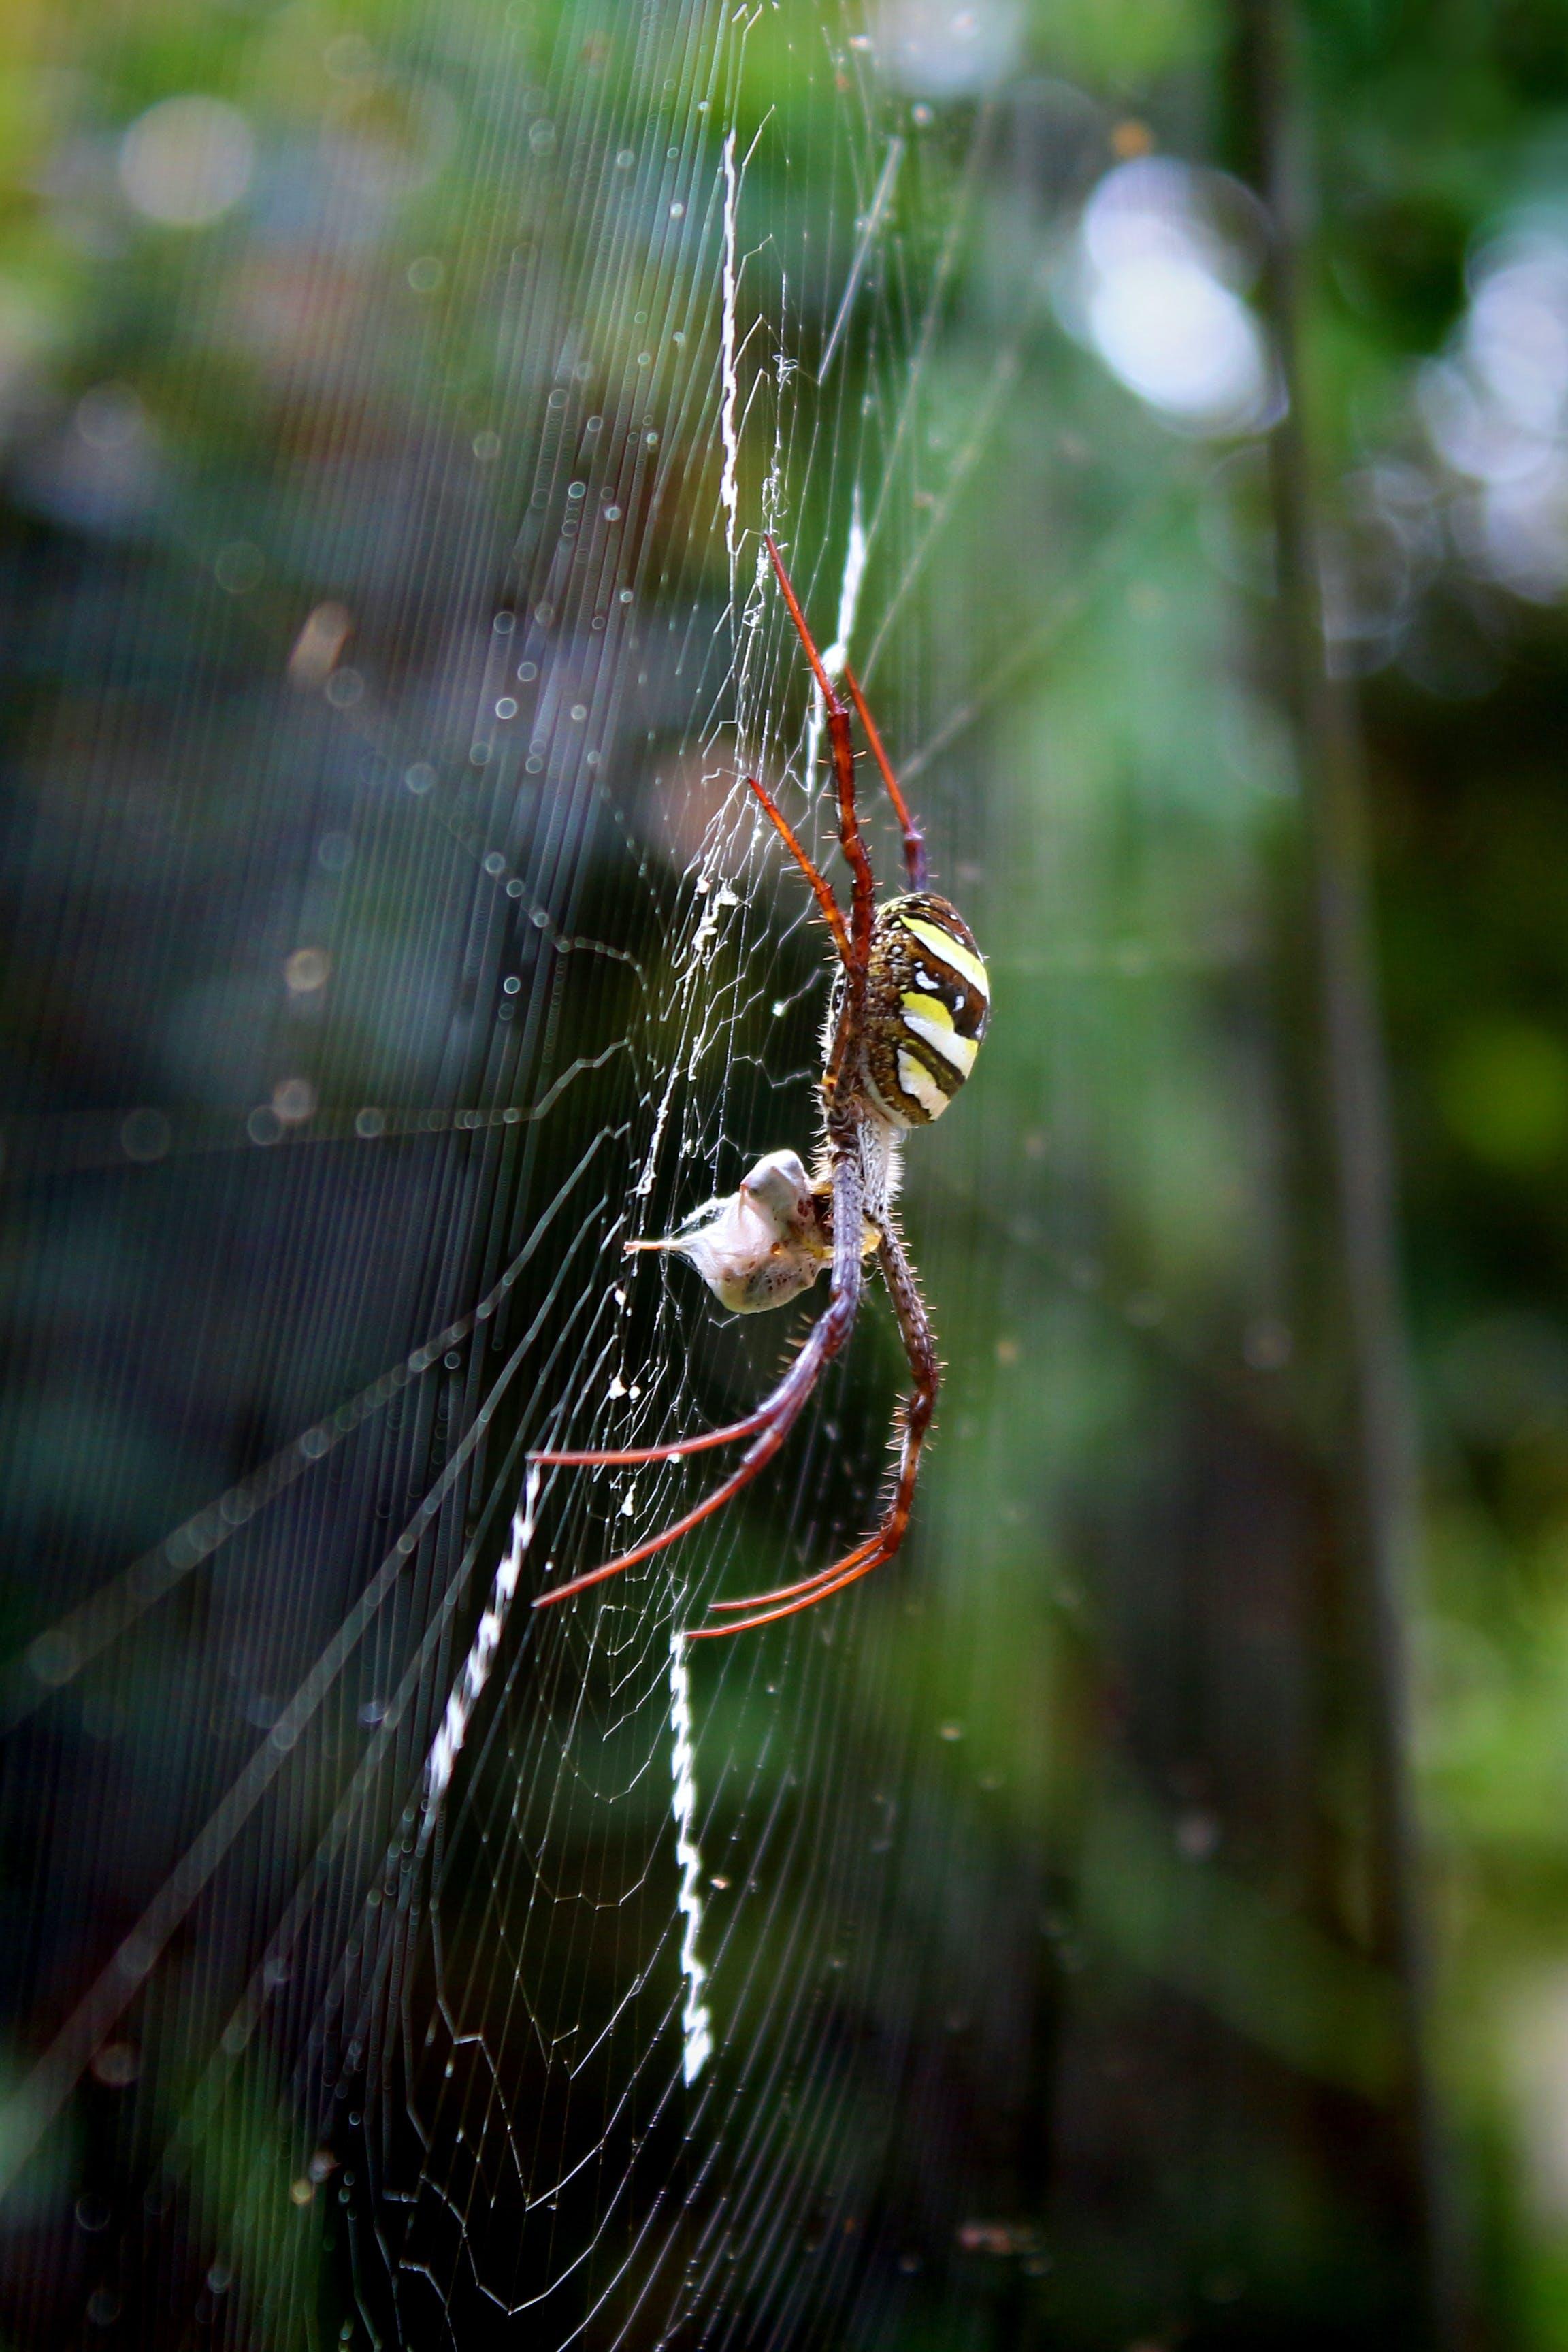 Free stock photo of animal, araneae, cobweb, danger